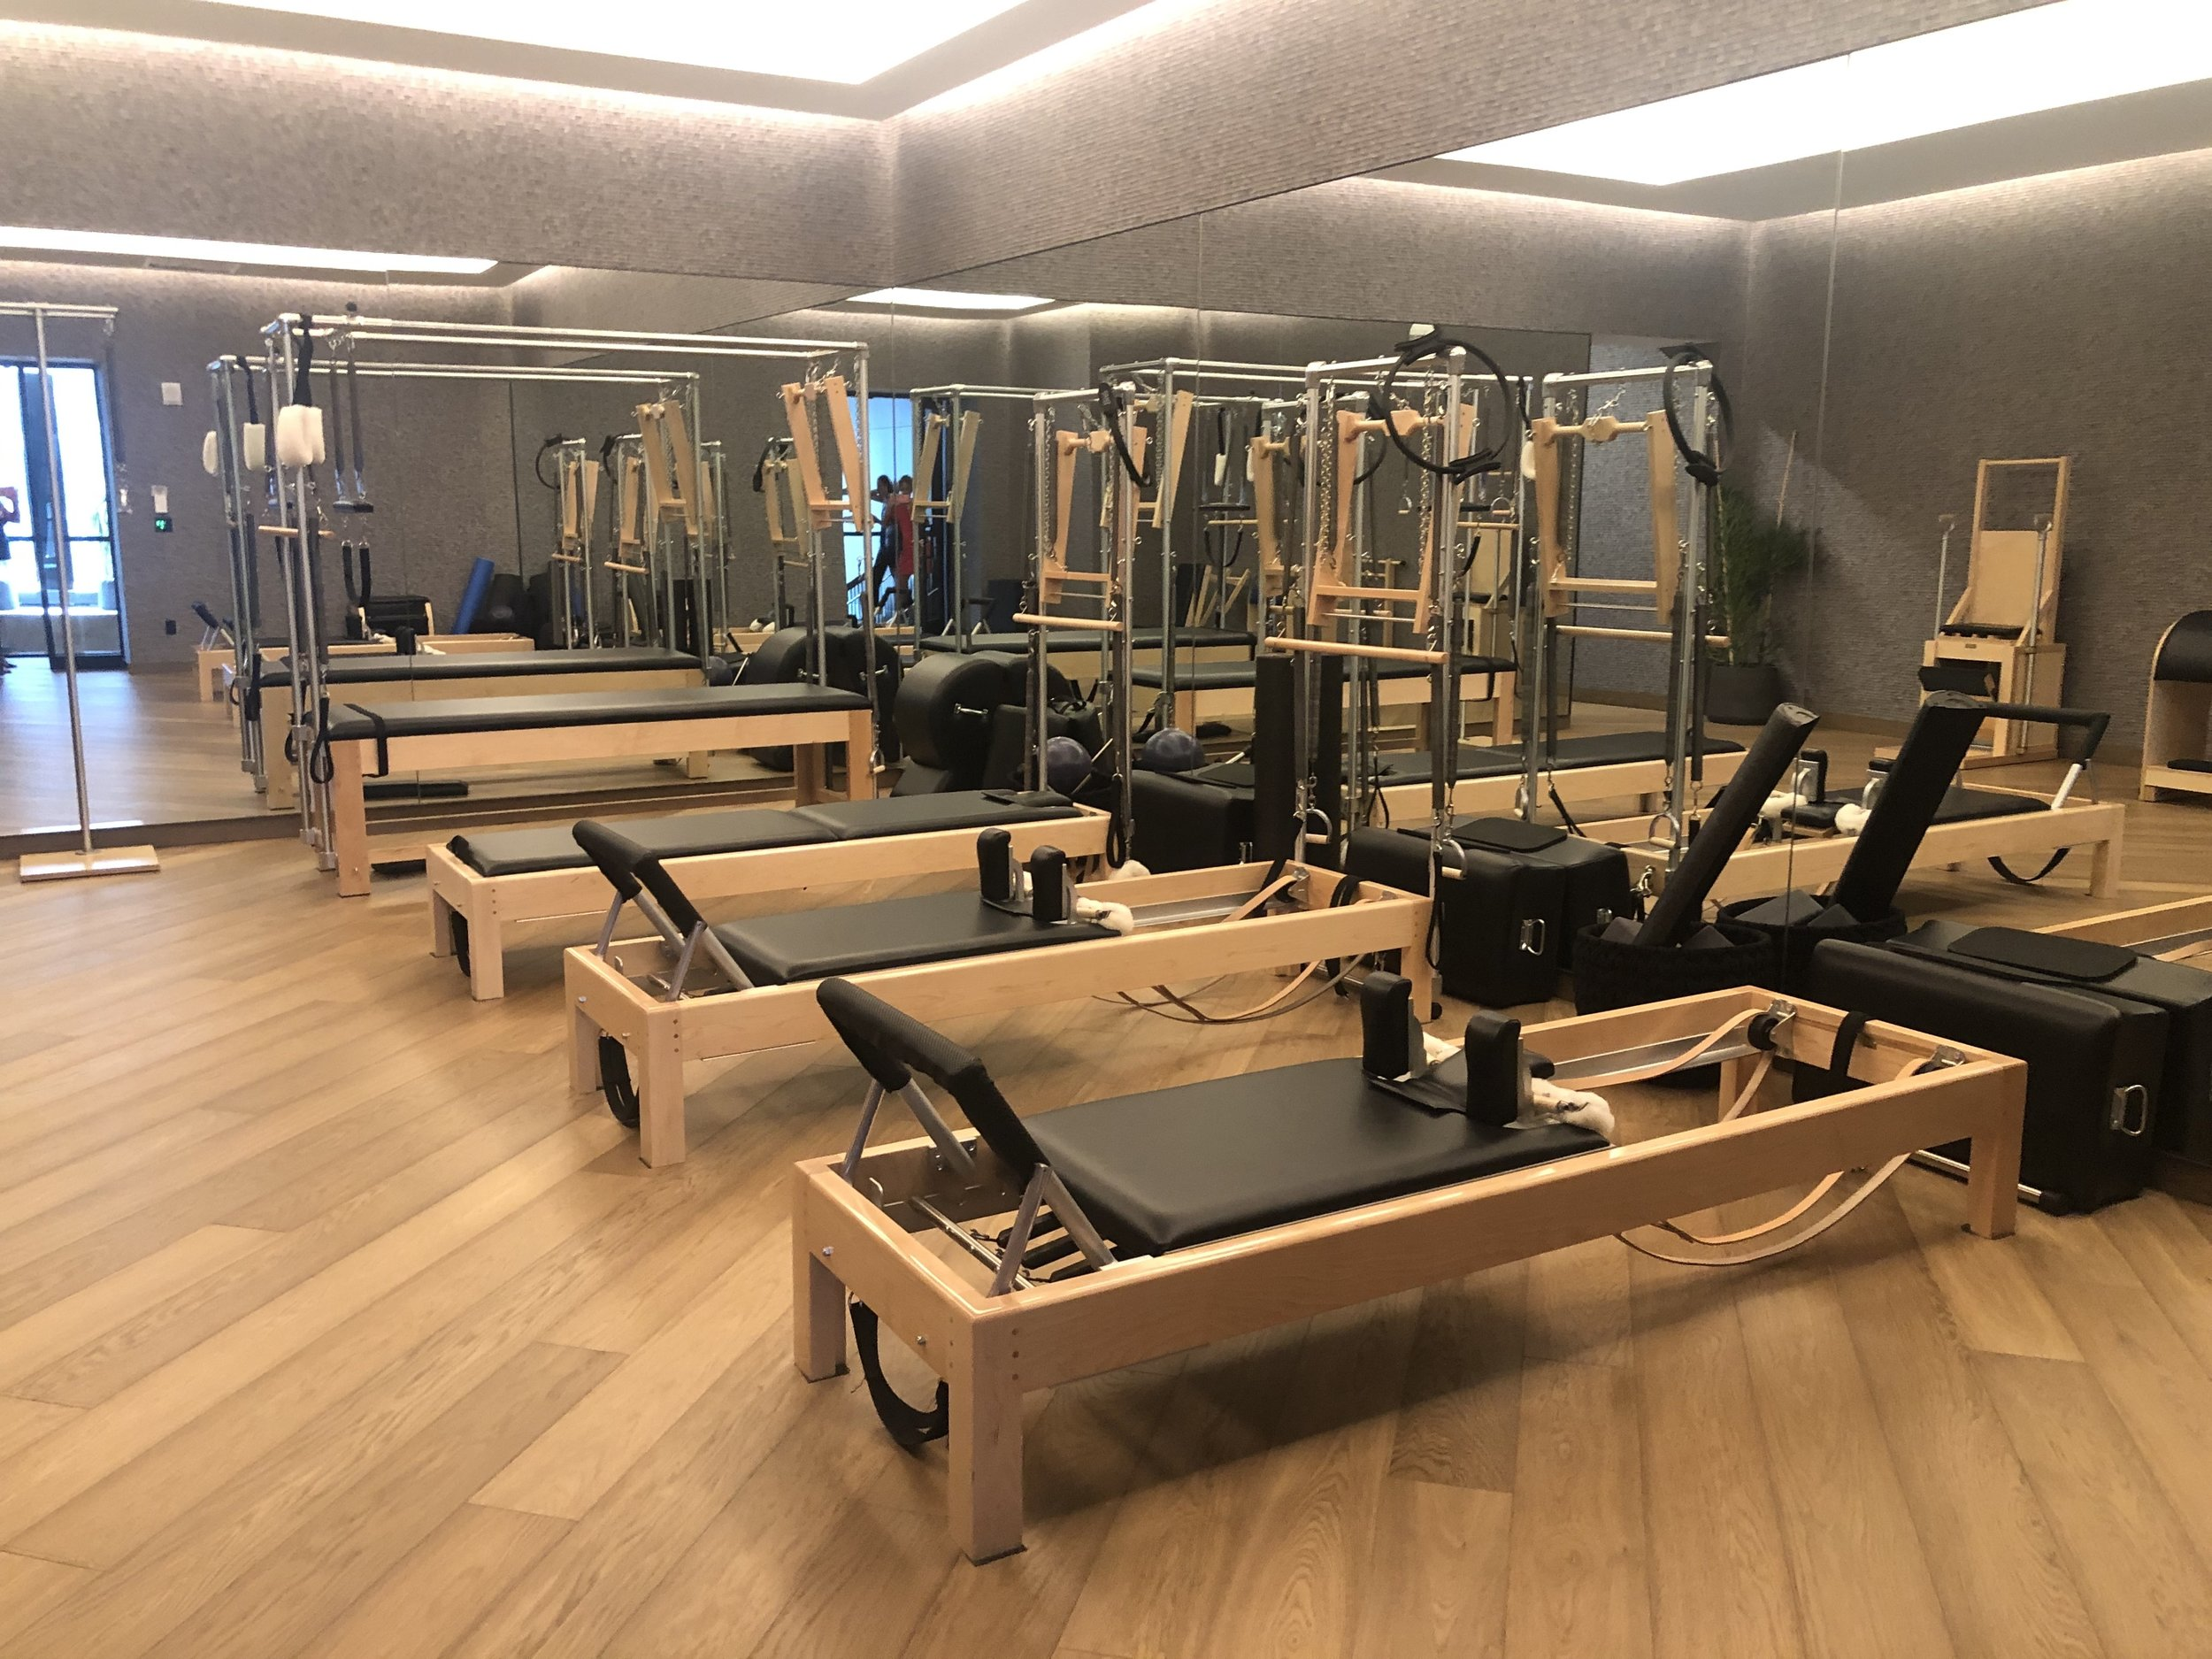 Wanderlust-Travel-blog-Equinox-Hotel-fitness-center